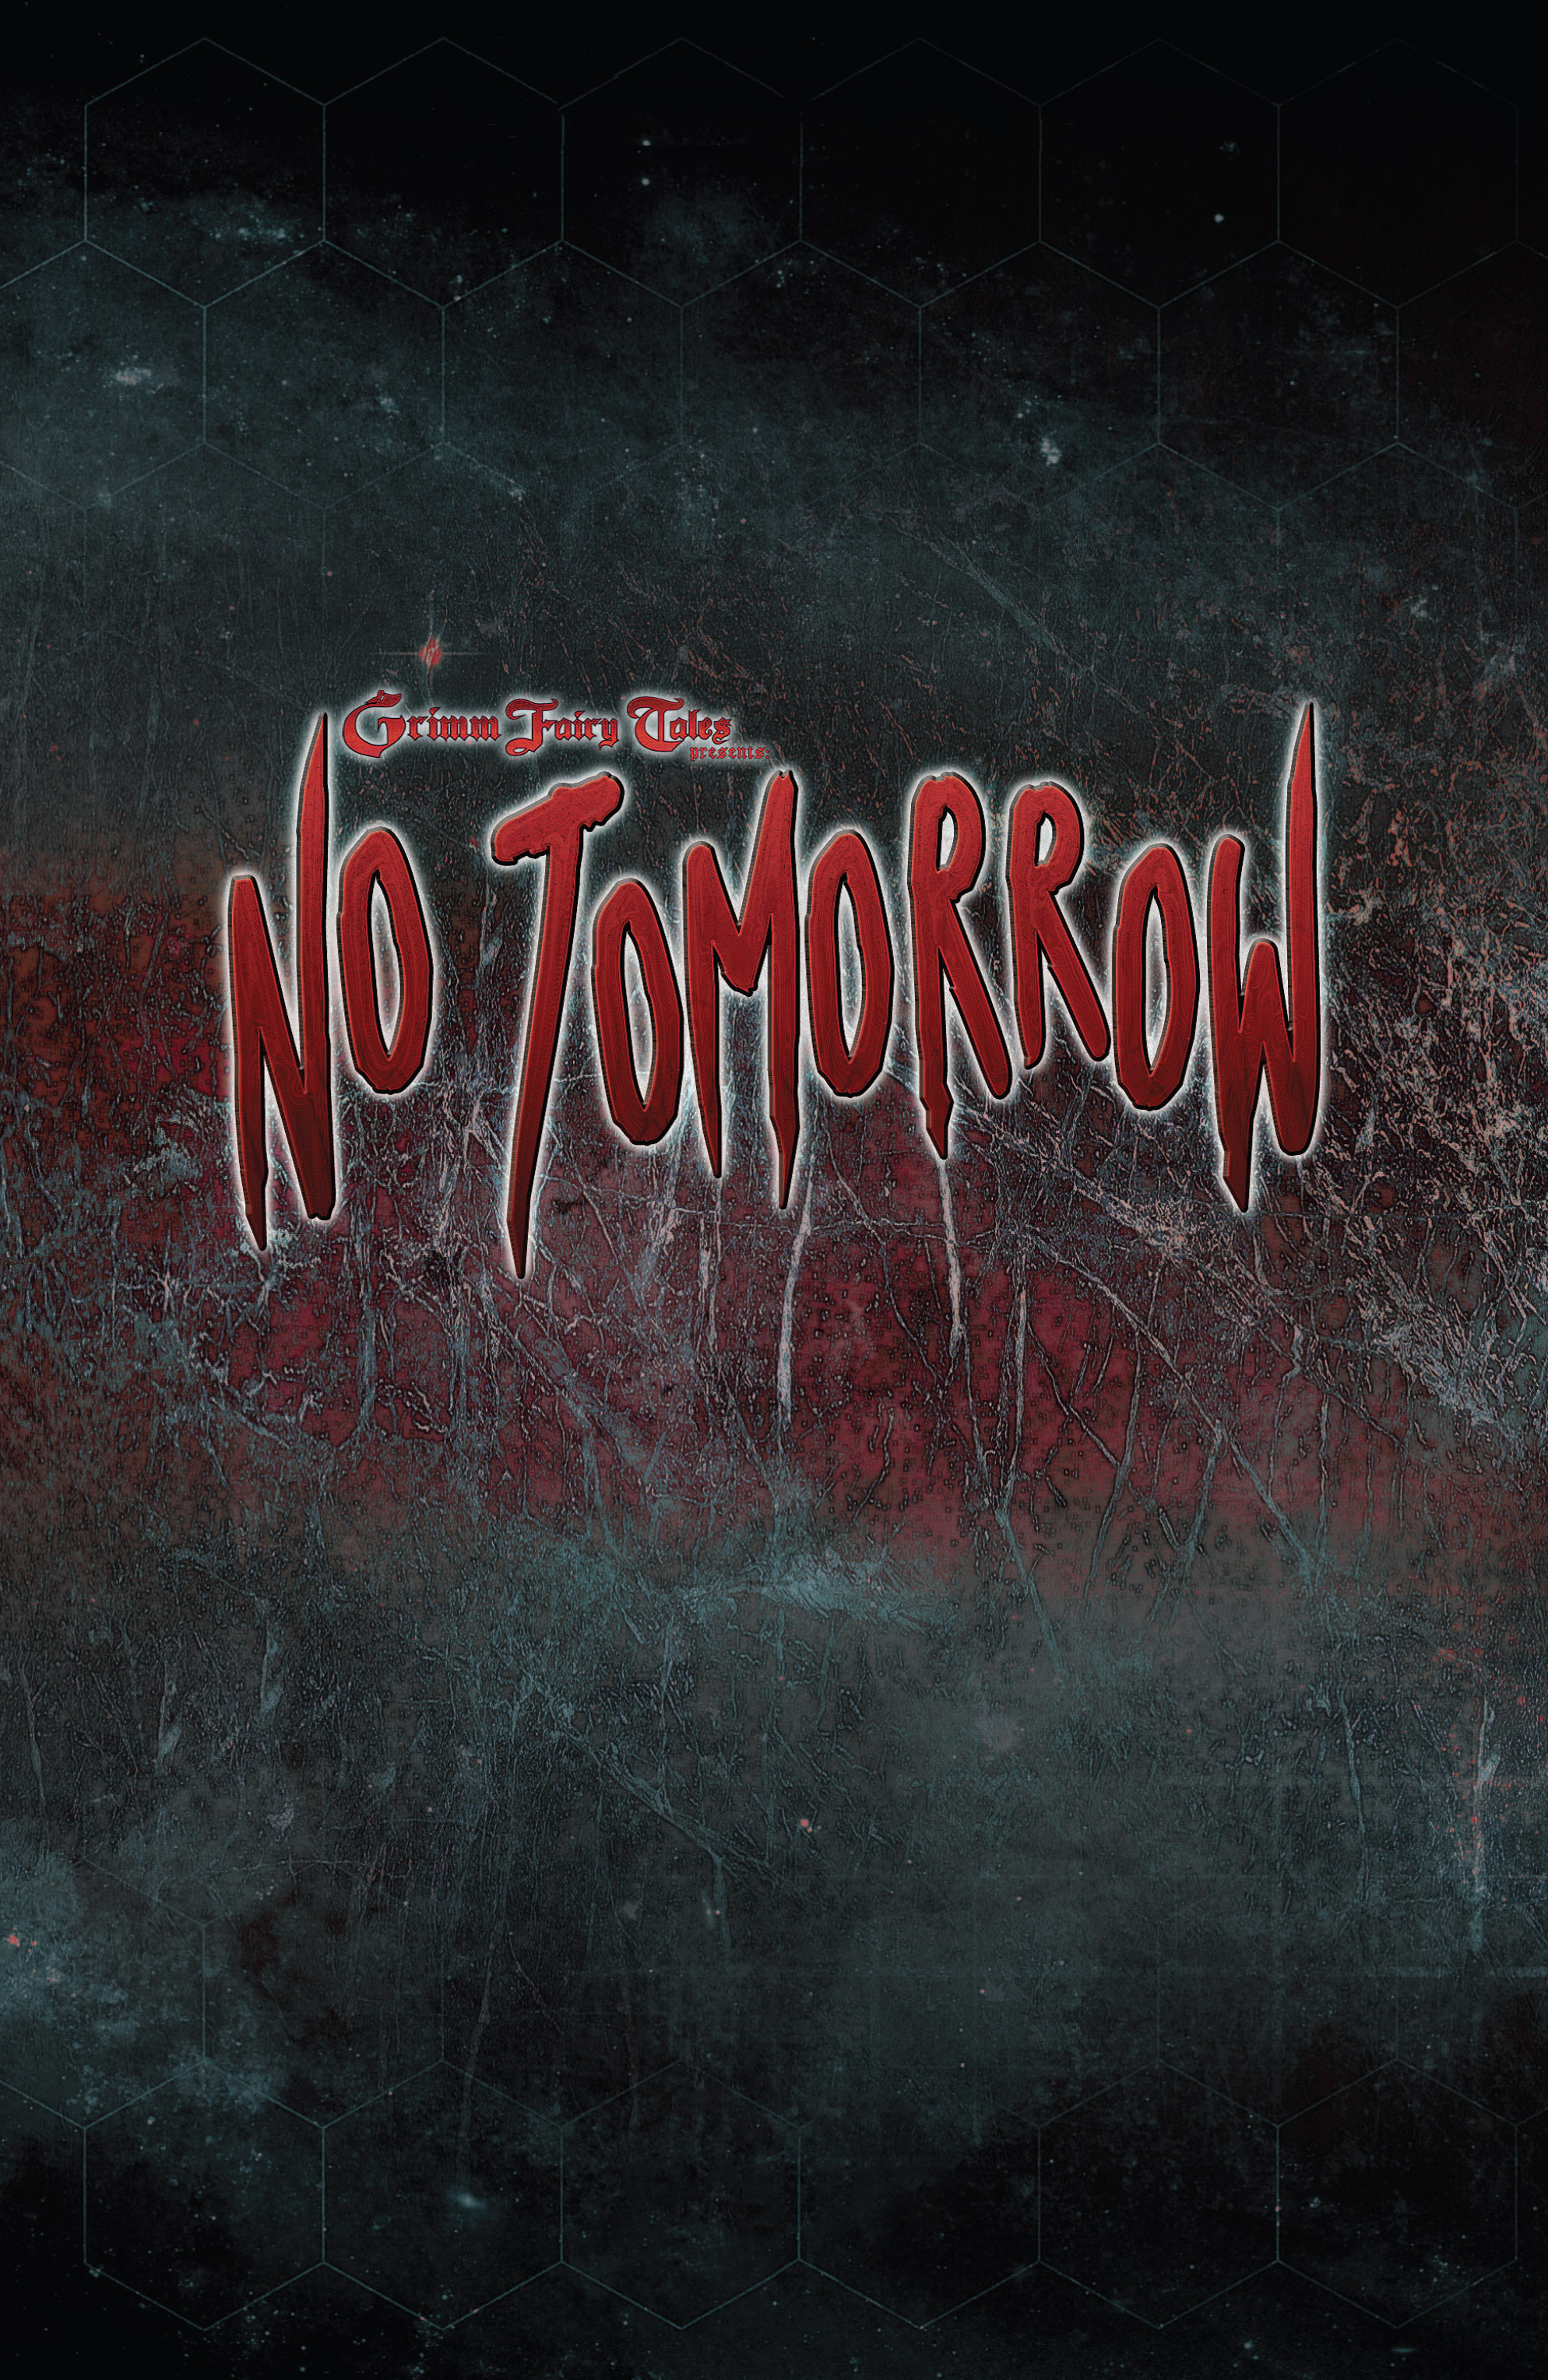 Read online Grimm Fairy Tales presents No Tomorrow comic -  Issue # TPB - 4